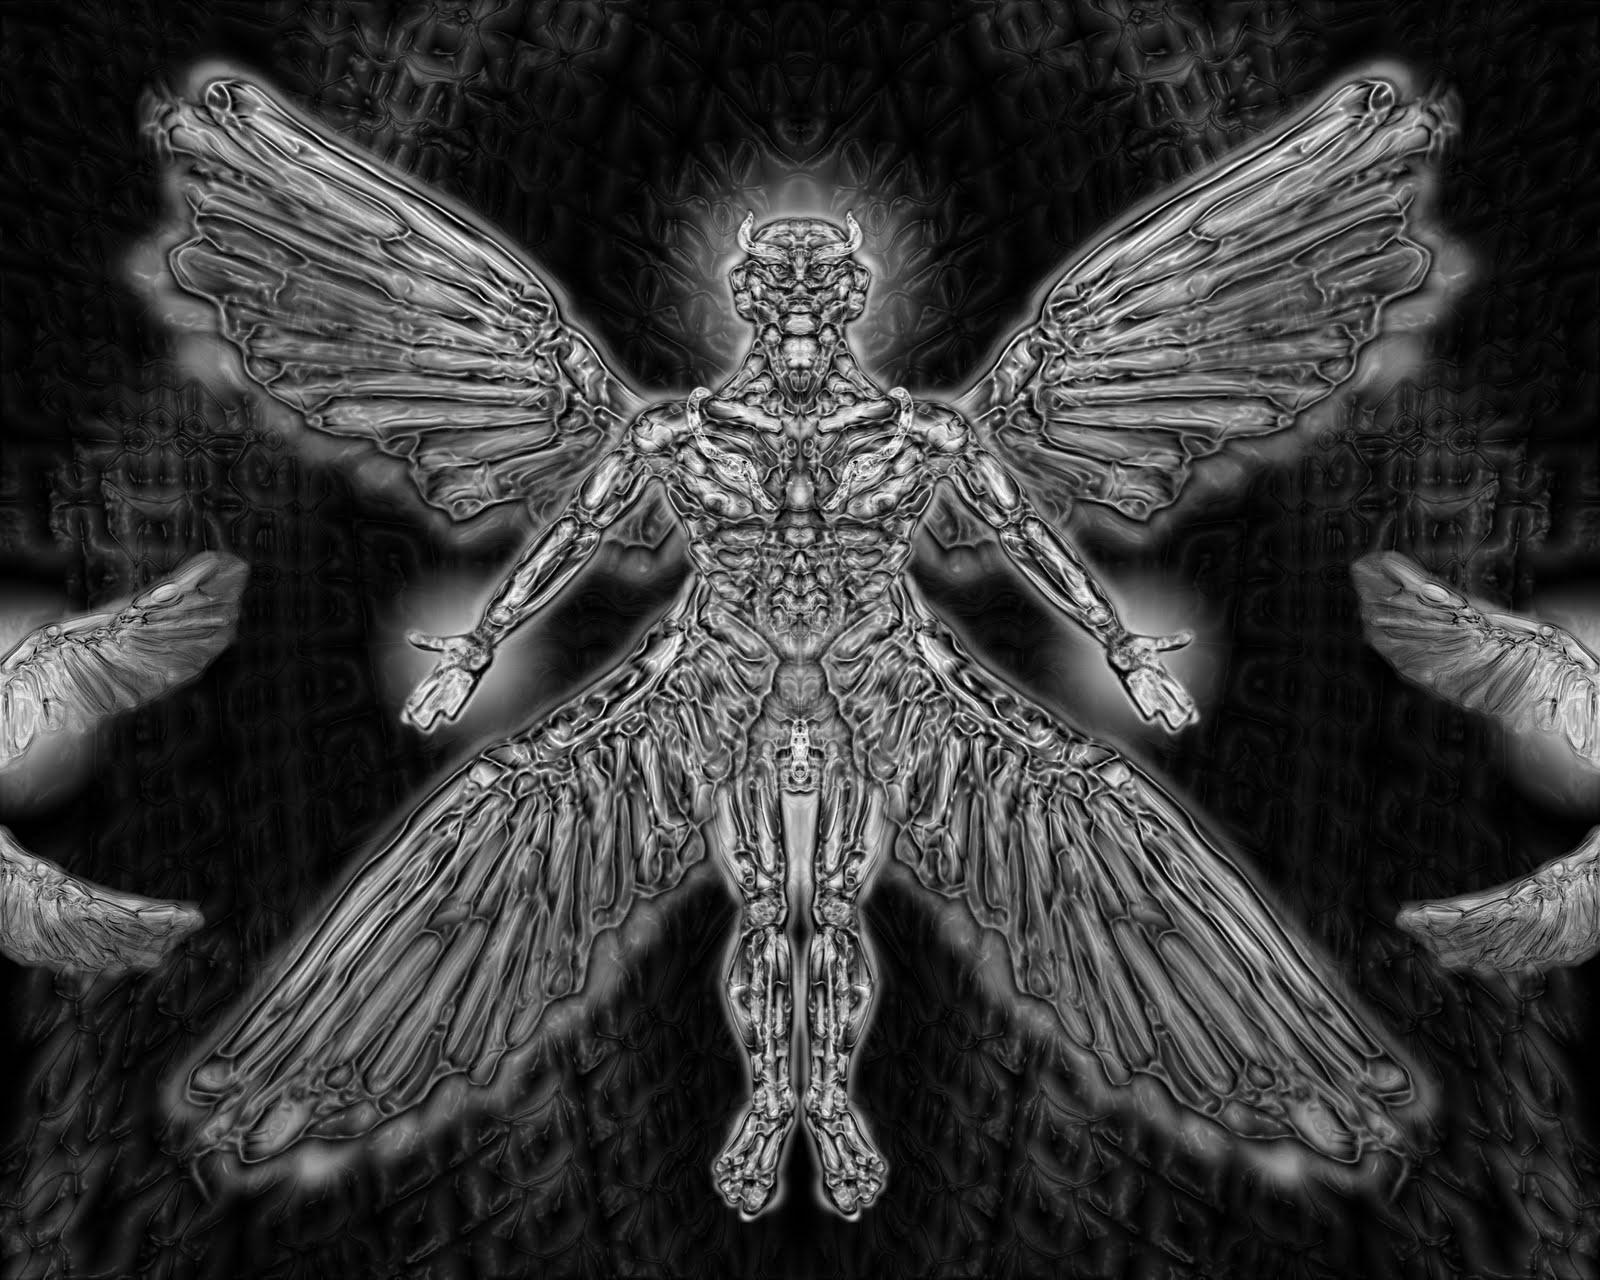 cherubim images